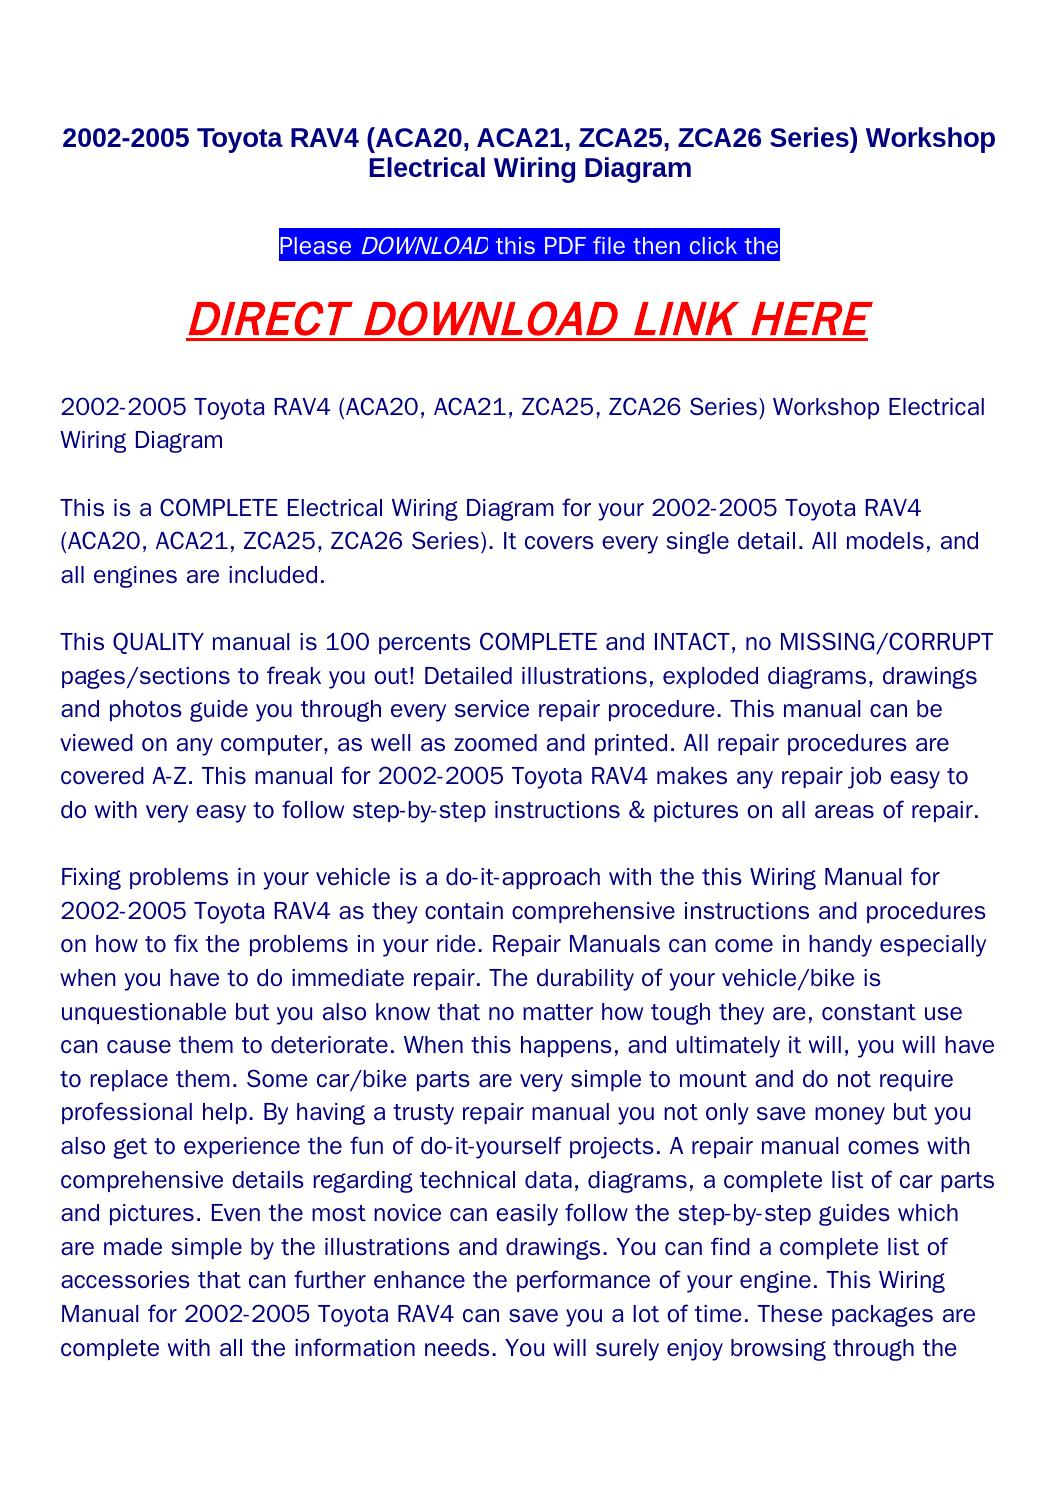 1996 Itasca Wiring Diagrams